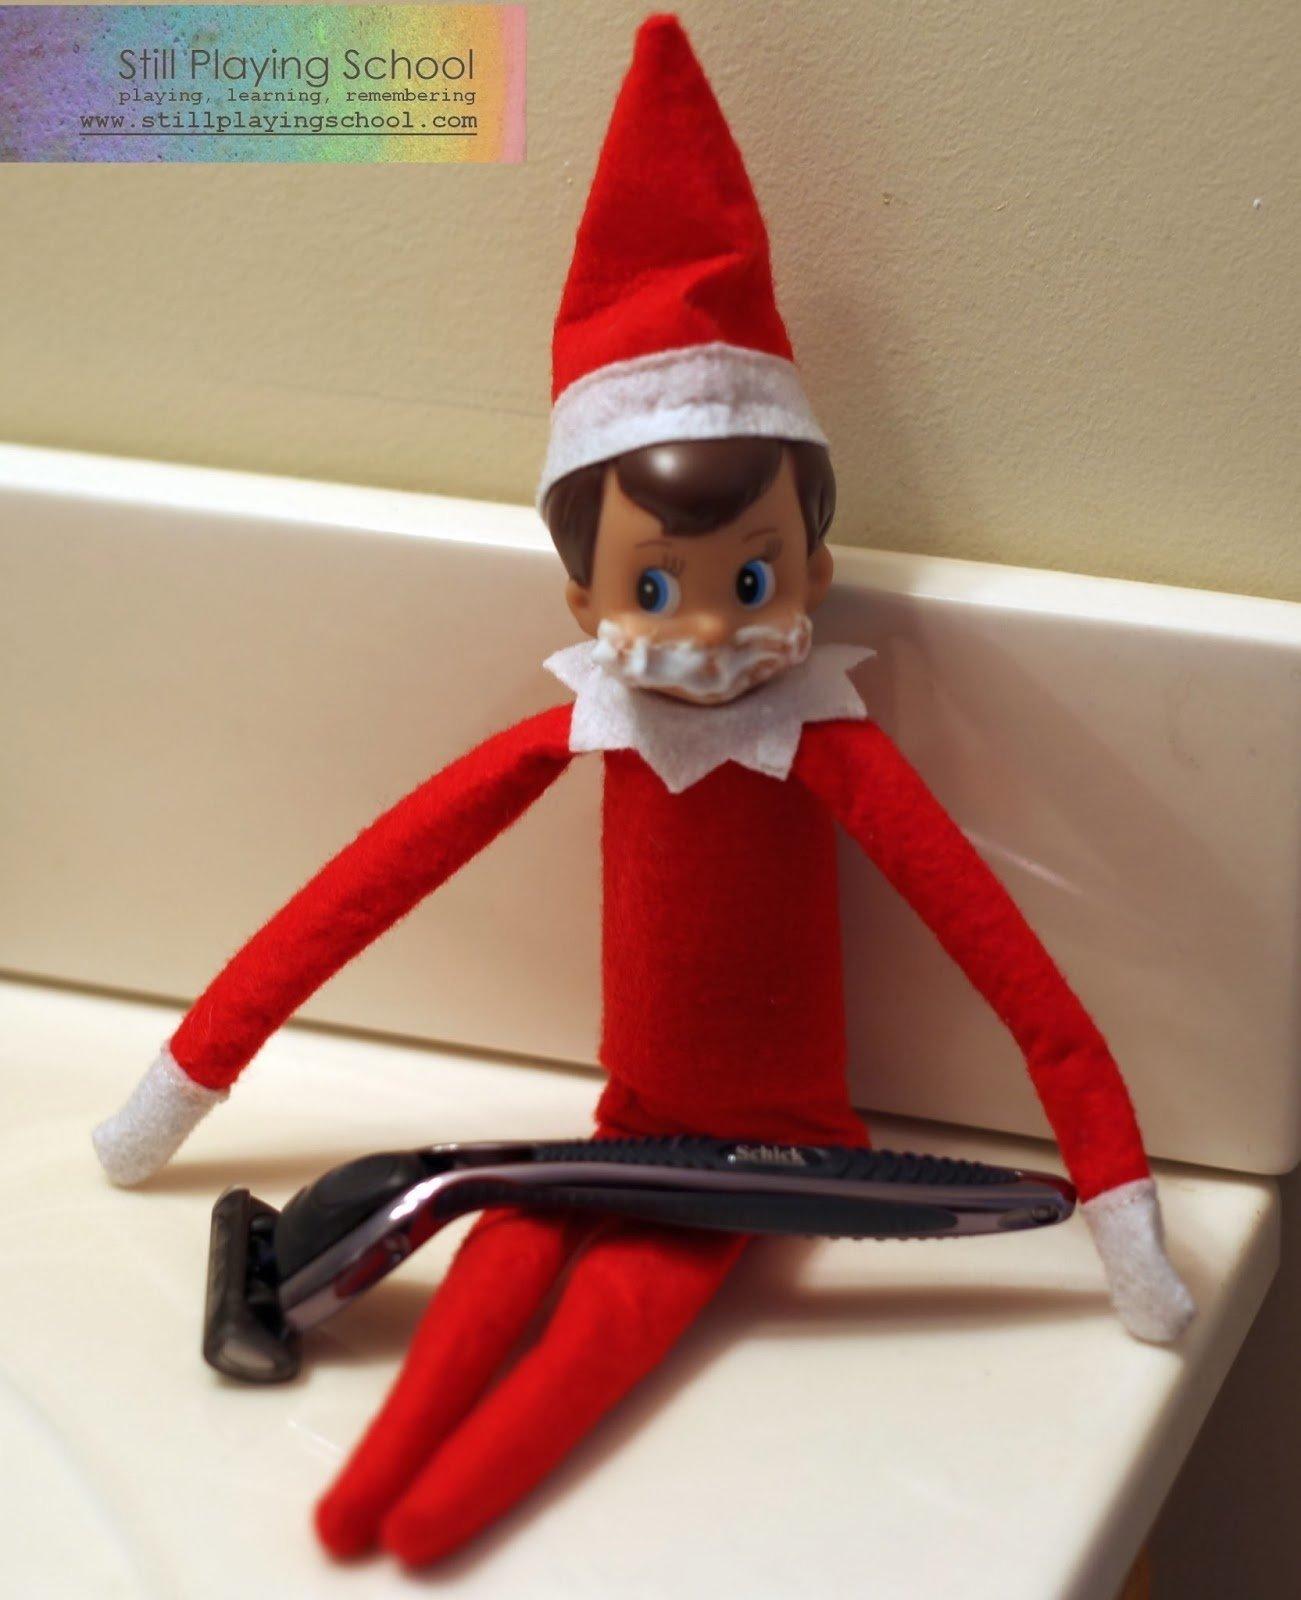 10 Stunning Ideas For Elf On Shelf a month of elf on the shelf ideas still playing school 3